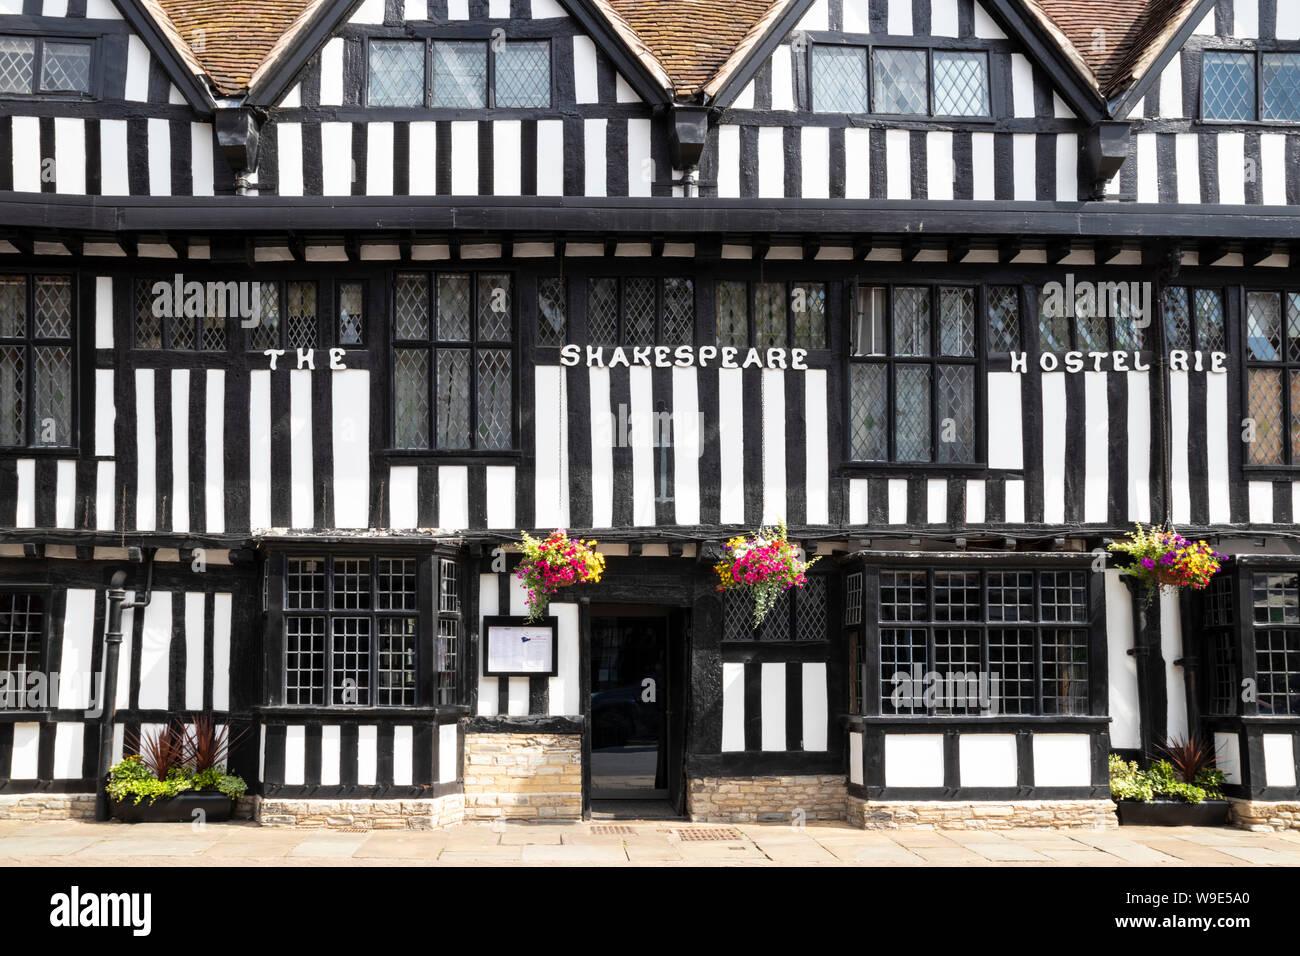 The Shakespeare hostelrie or Mercure Stratford upon Avon Shakespeare Hotel Stratford-upon-Avon Stratford upon Avon Warwickshire England UK GB Europe Stock Photo